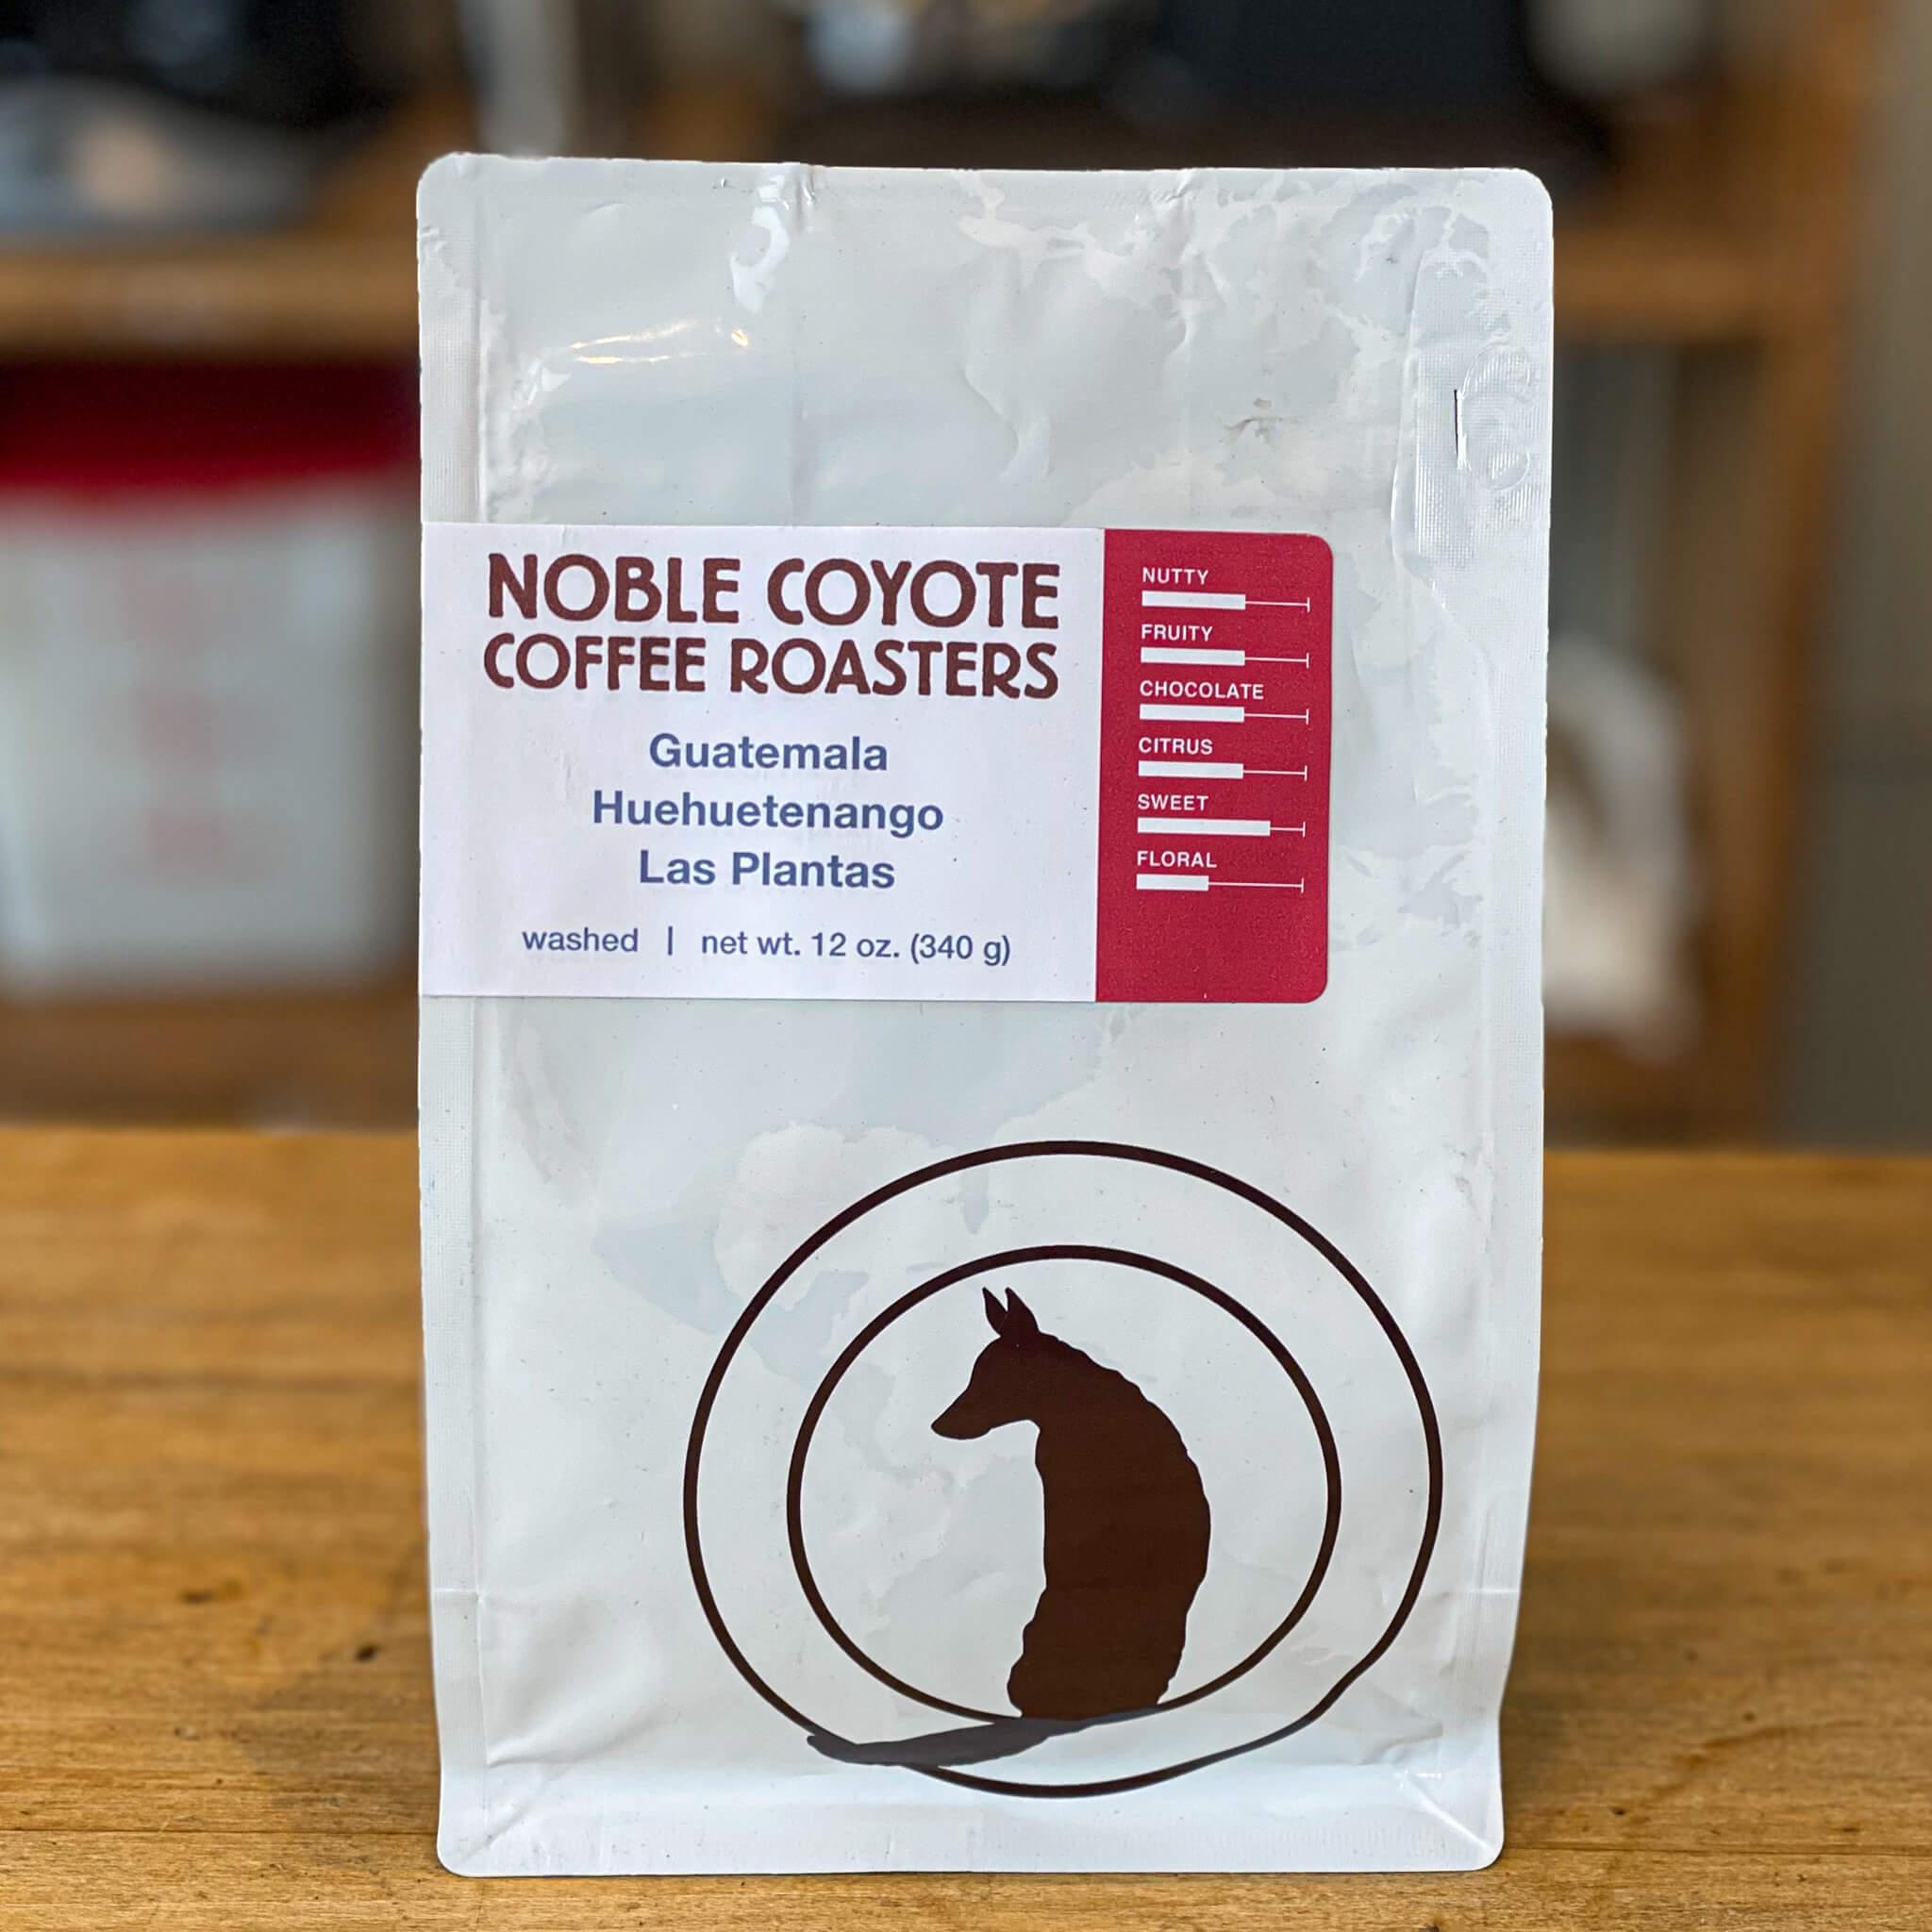 Guatemala Las Plantas from Noble Coyote Coffee Roasters